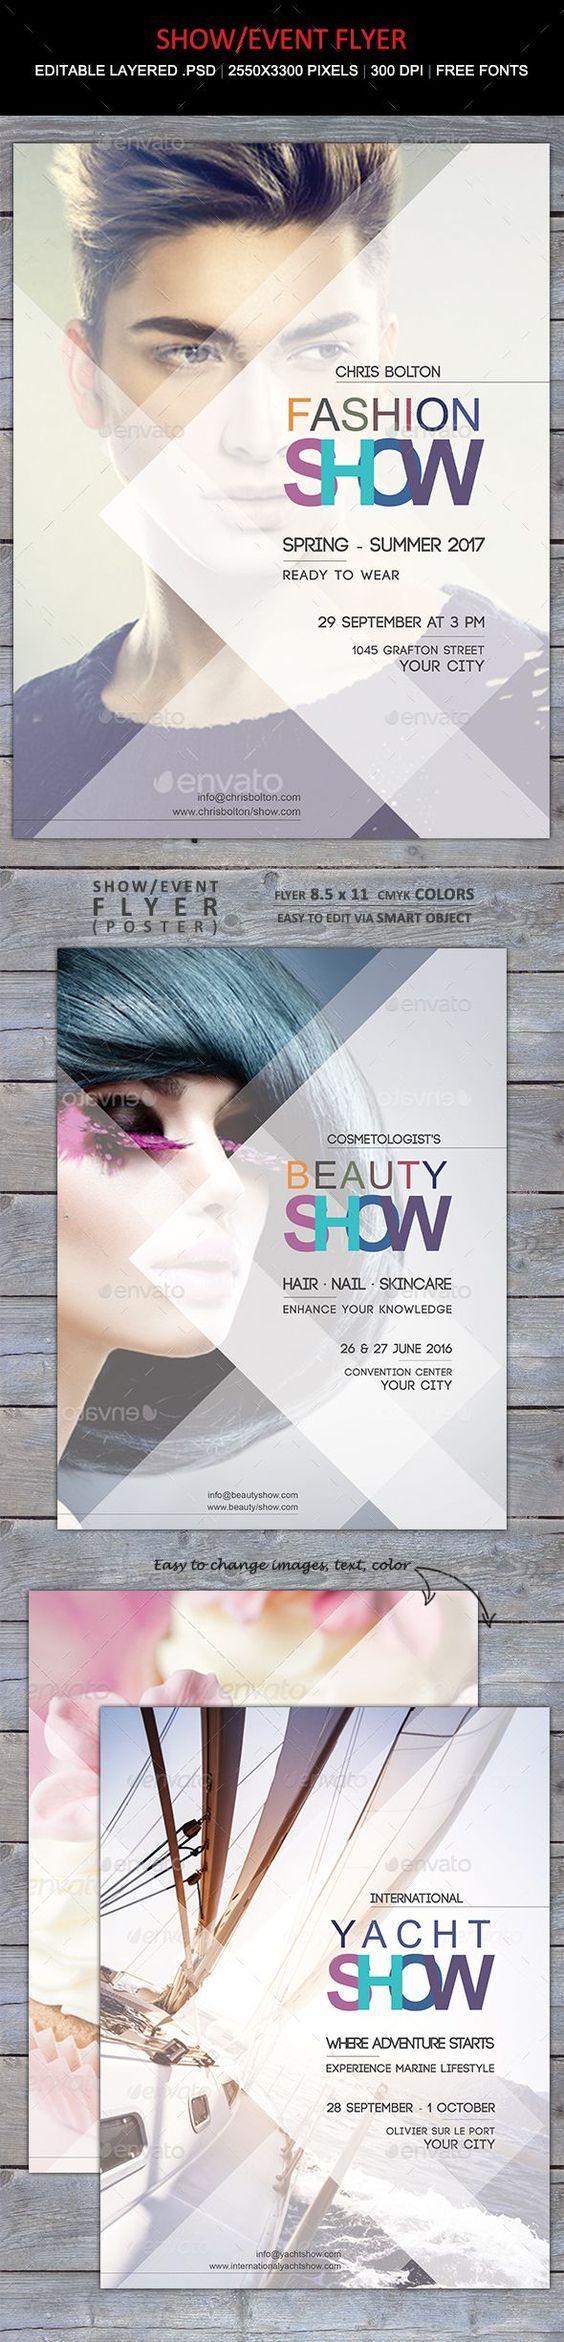 Luxury Ereignis Flyer Photos - FORTSETZUNG ARBEITSBLATT - tsuhaan.info